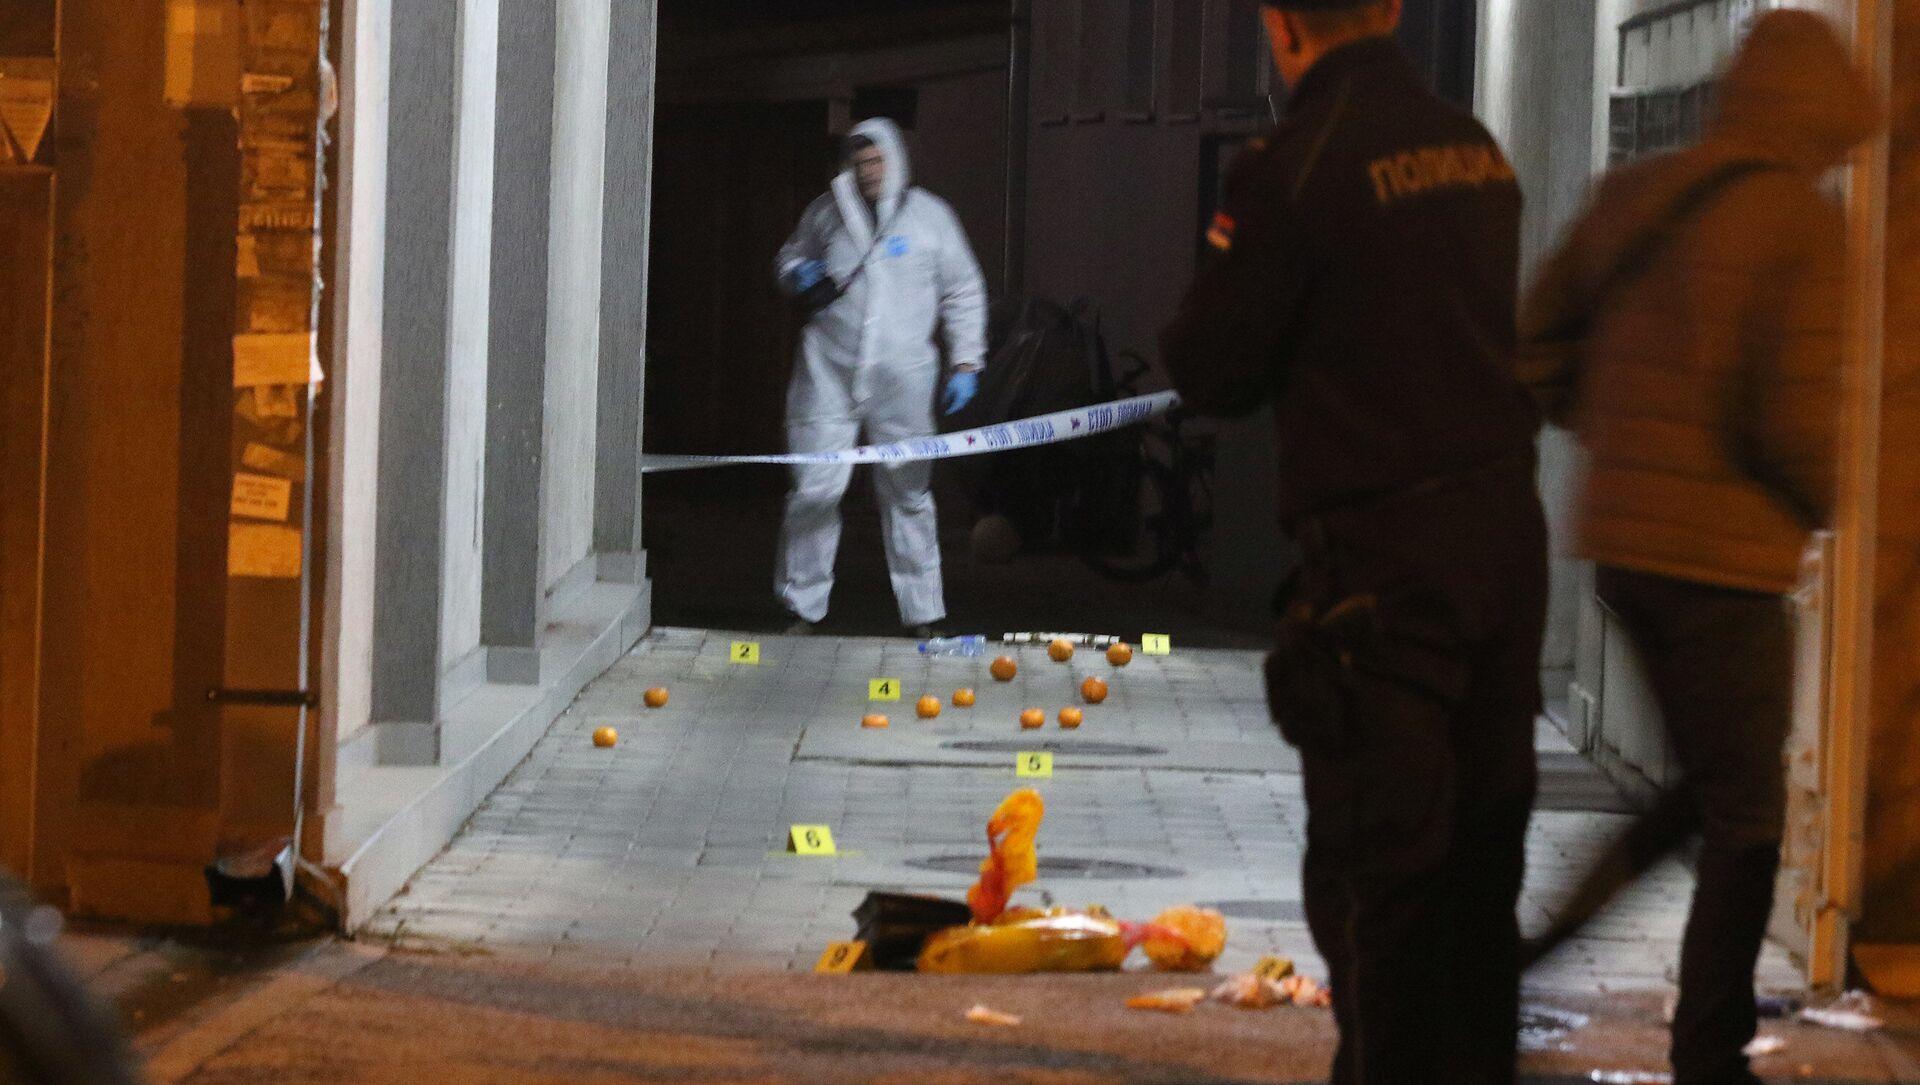 Policija vrši uviđaj u Novom Sadu - Sputnik Srbija, 1920, 21.02.2021